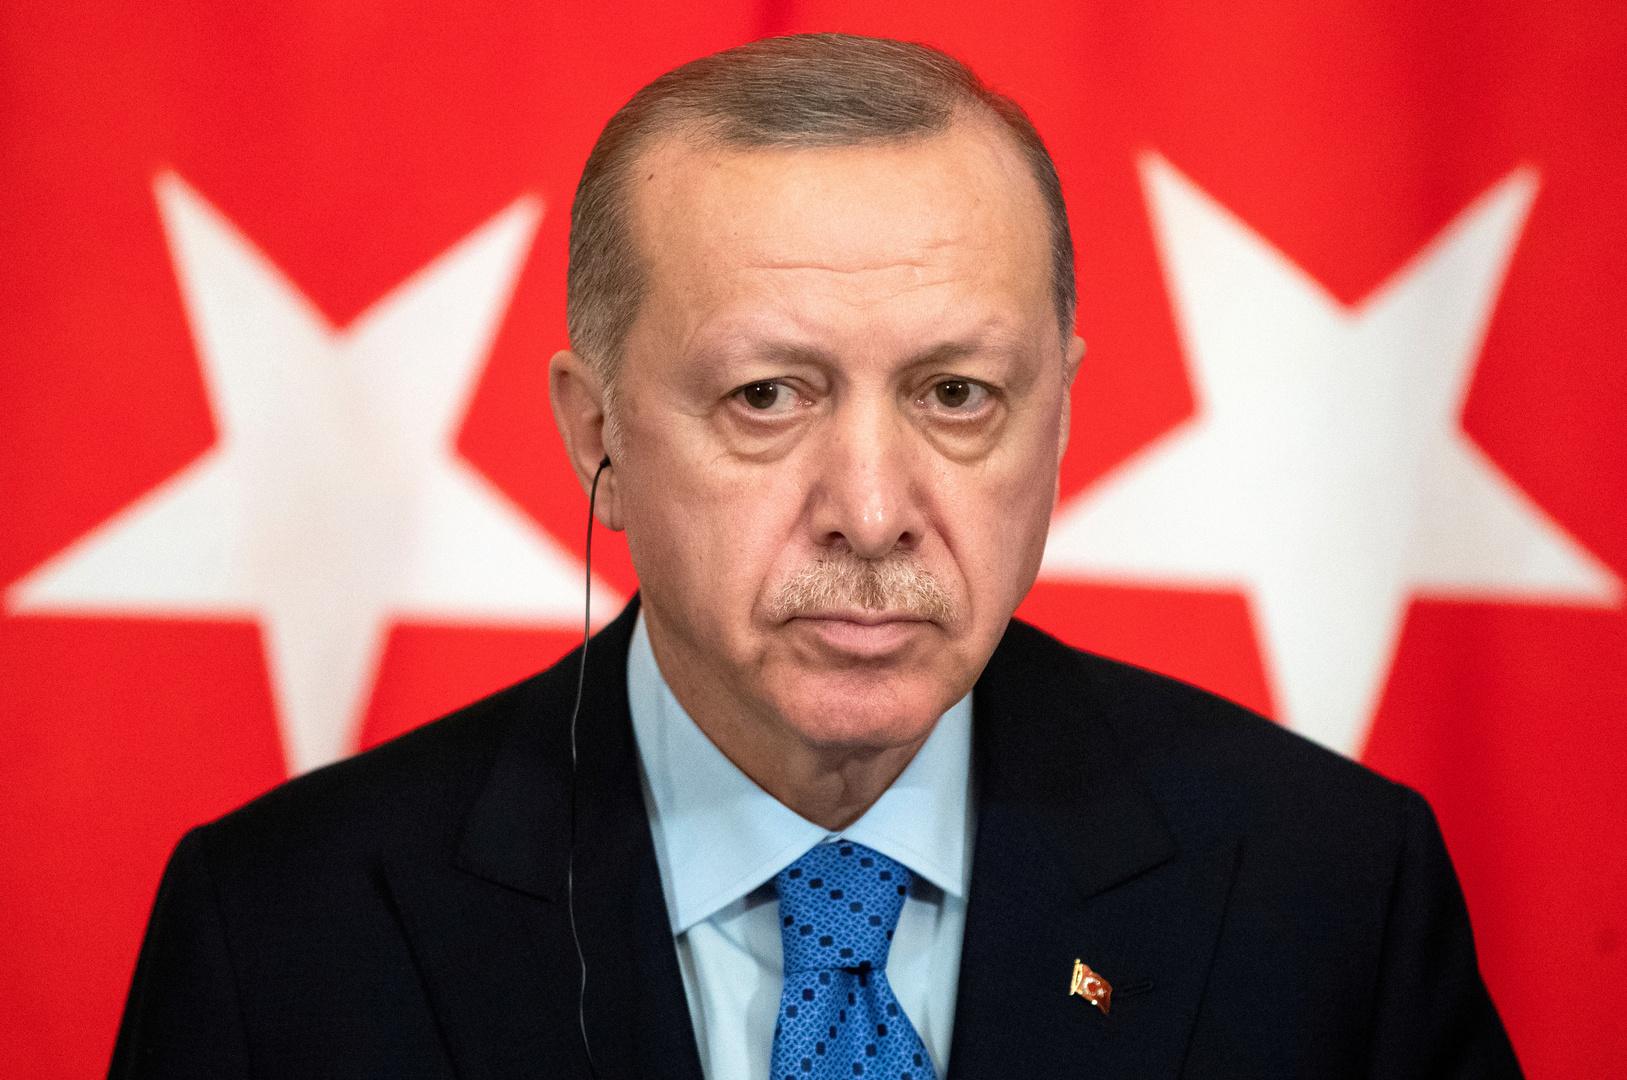 أردوغان: موجودون في ليبيا وأذربيجان وسوريا وشرقي المتوسط وسنبقى